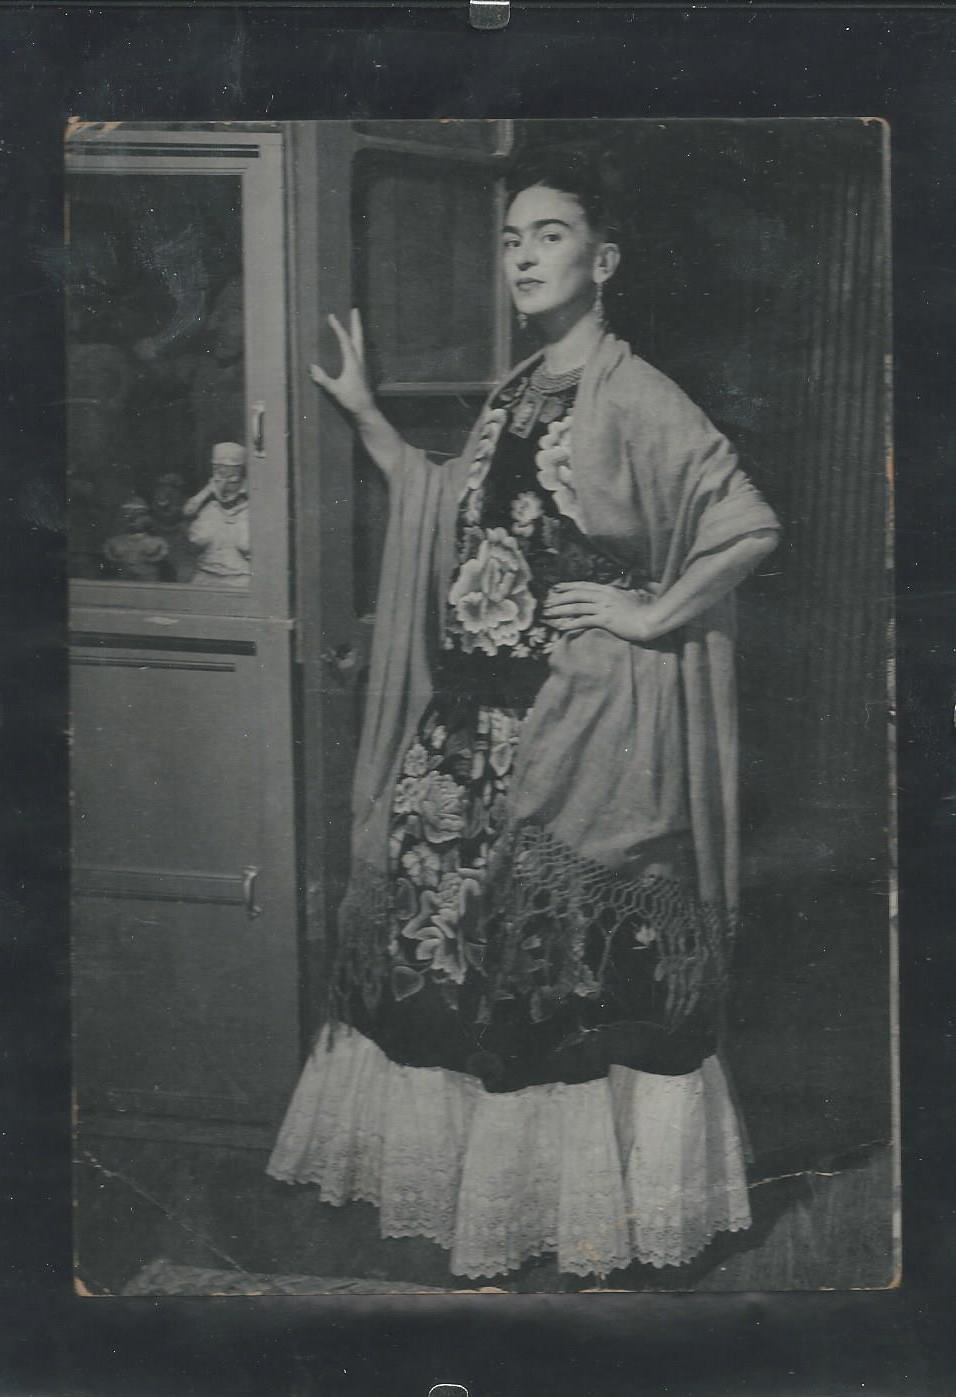 Unlocking the hidden life of Frida Kahlo